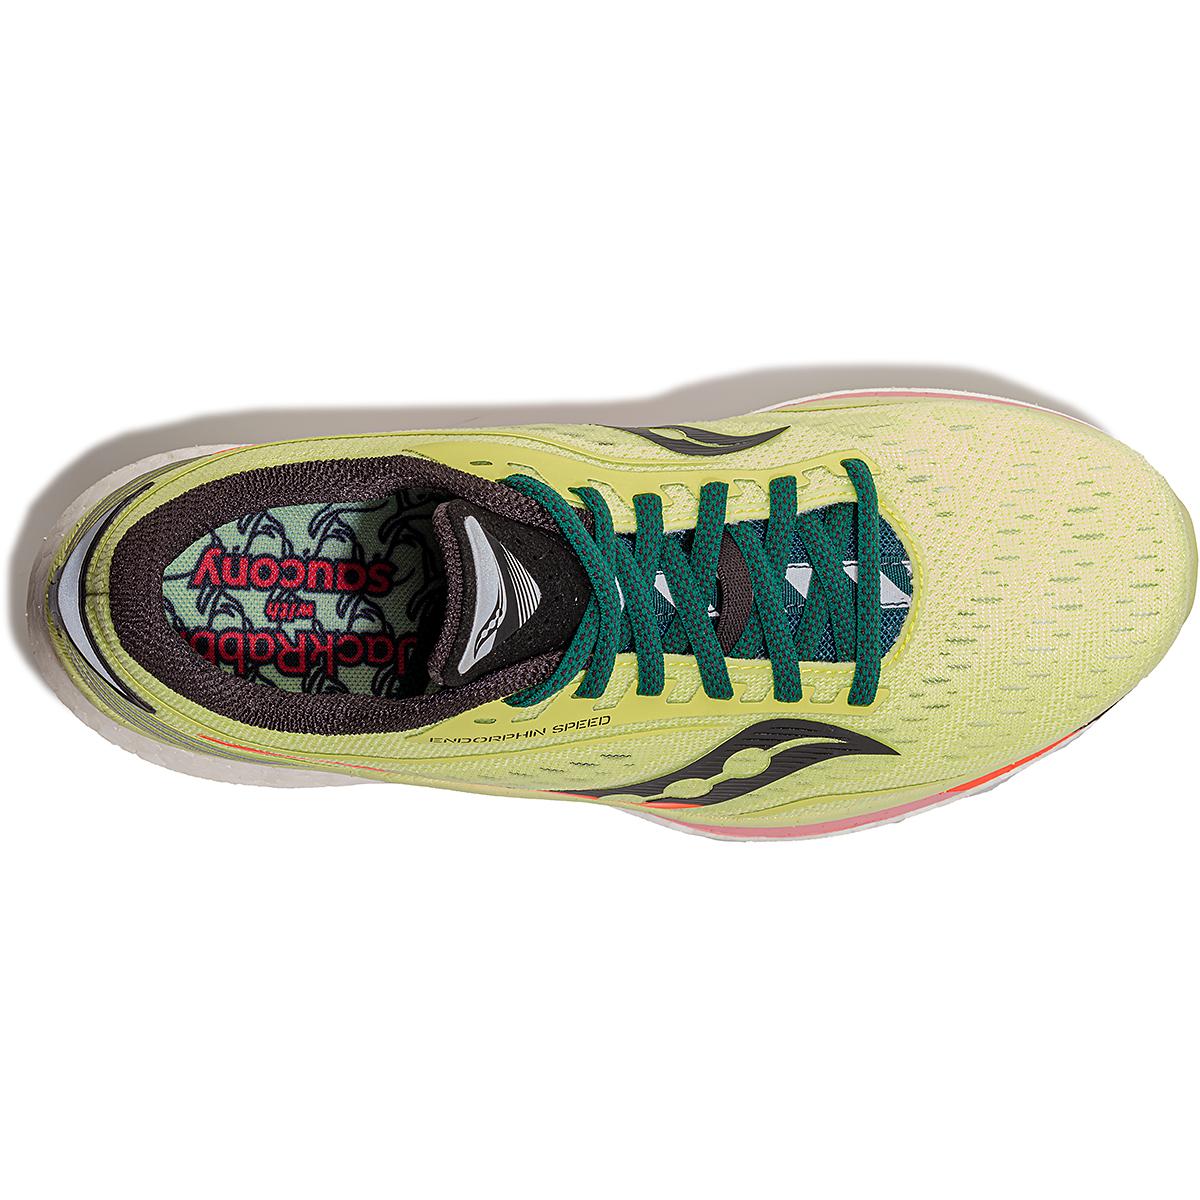 Women's Saucony Jackalope 2.0 Endorphin Speed Running Shoe - Color: Jackalope - Size: 5 - Width: Regular, Jackalope, large, image 2